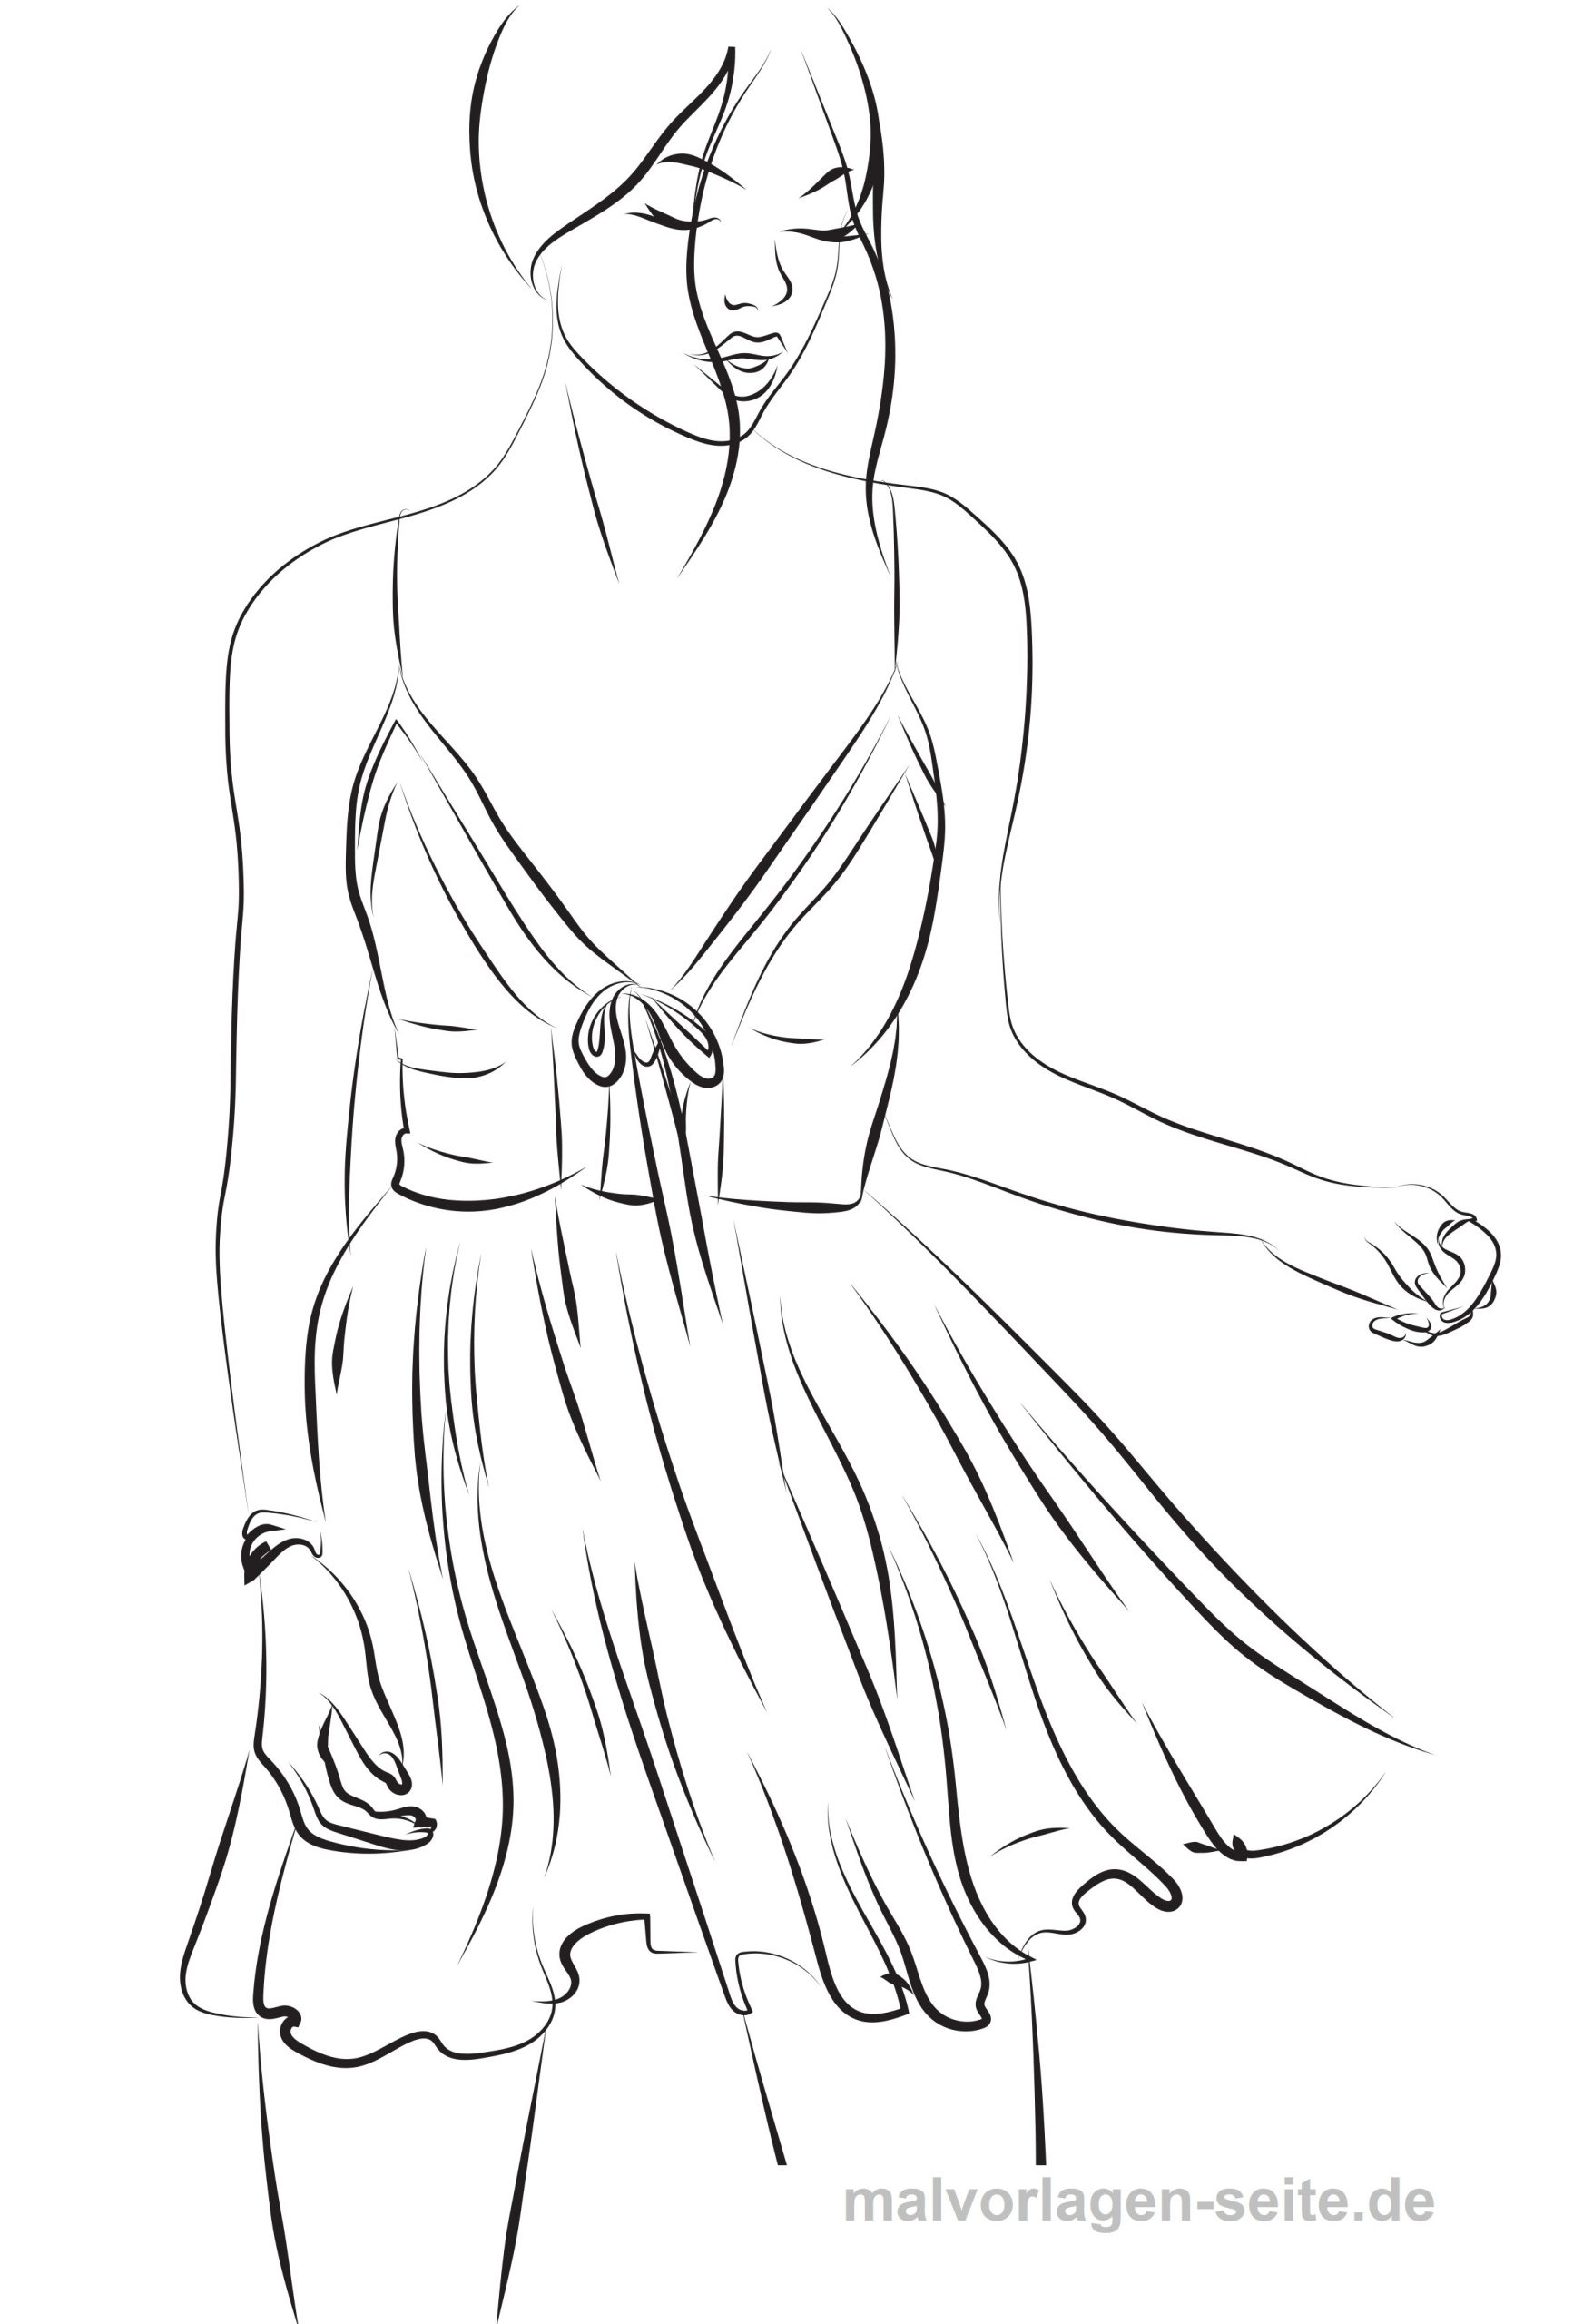 Model Ausmalen Topmodel Malvorlage Kleid - Ausmalbilder innen Topmodel Bilder Zum Ausmalen